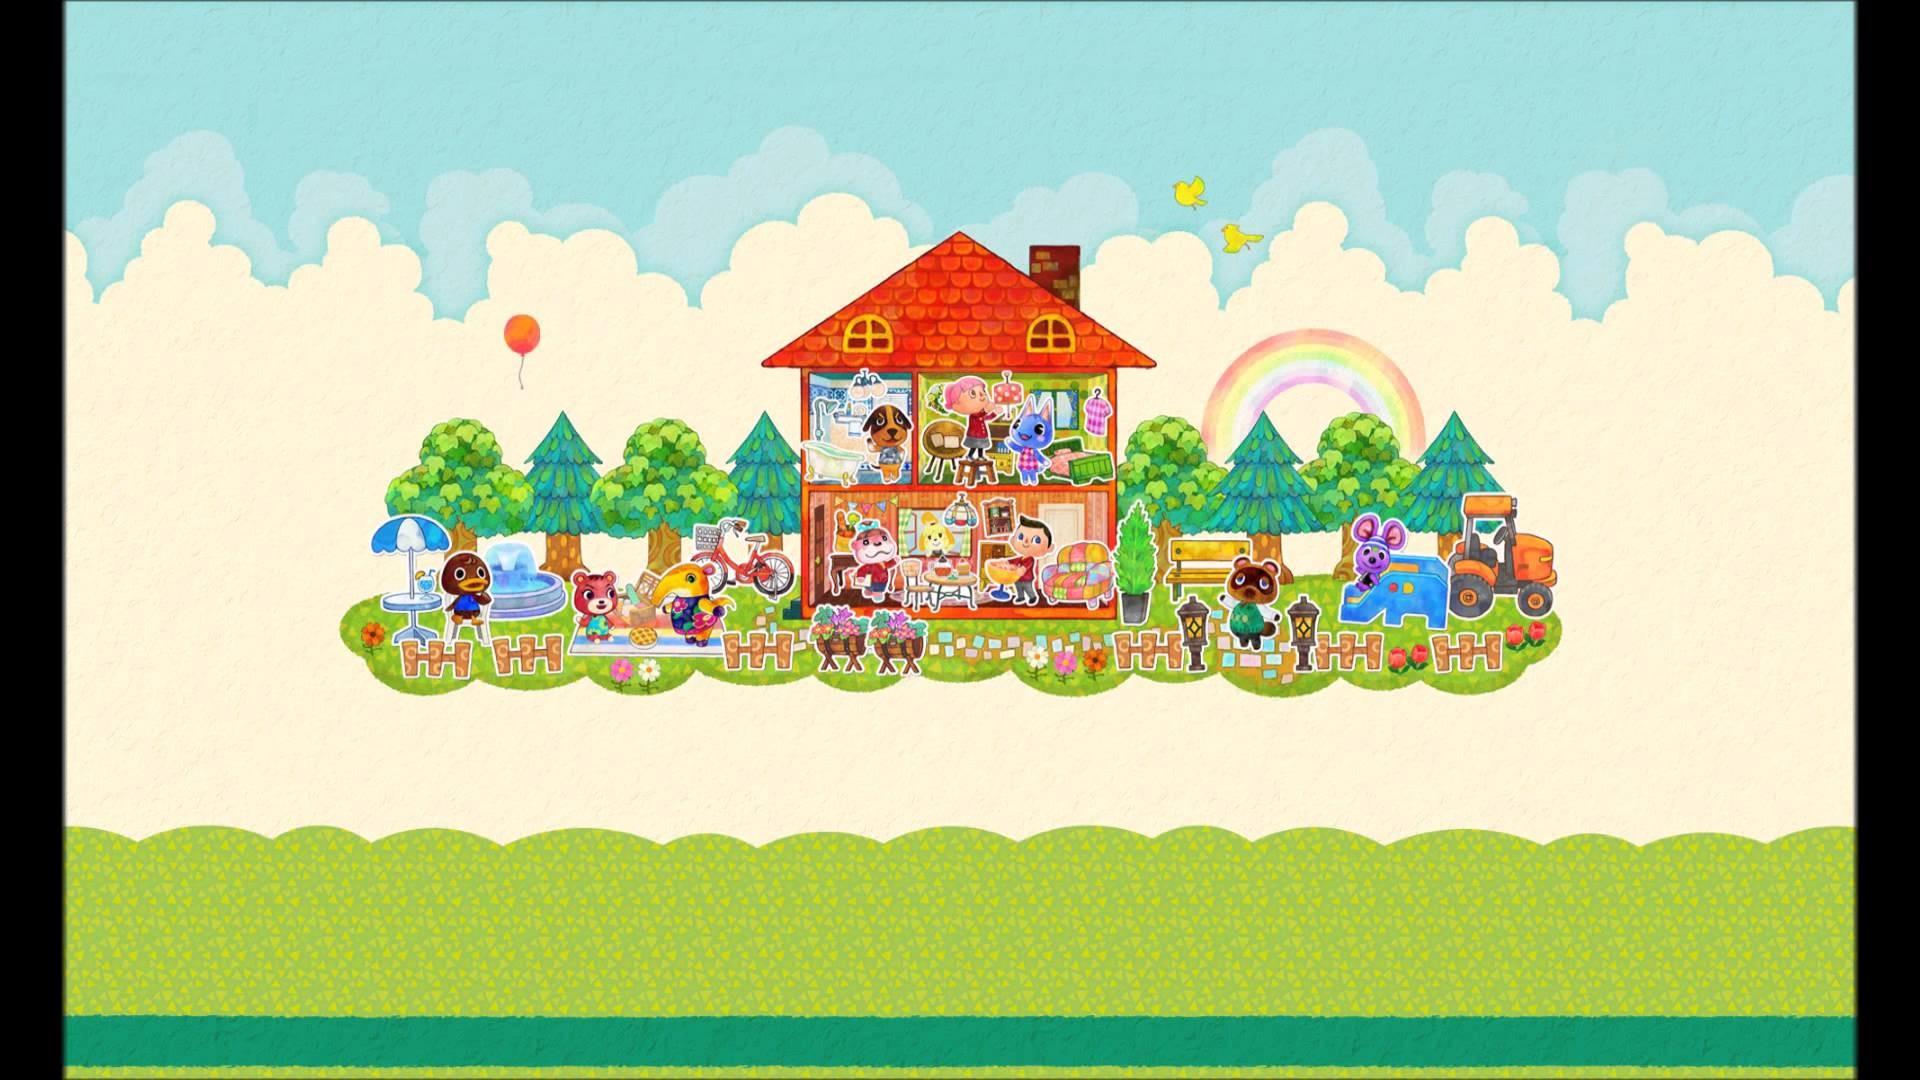 Full Hd Cute Boy Wallpaper Animal Crossing Desktop Wallpaper 80 Images